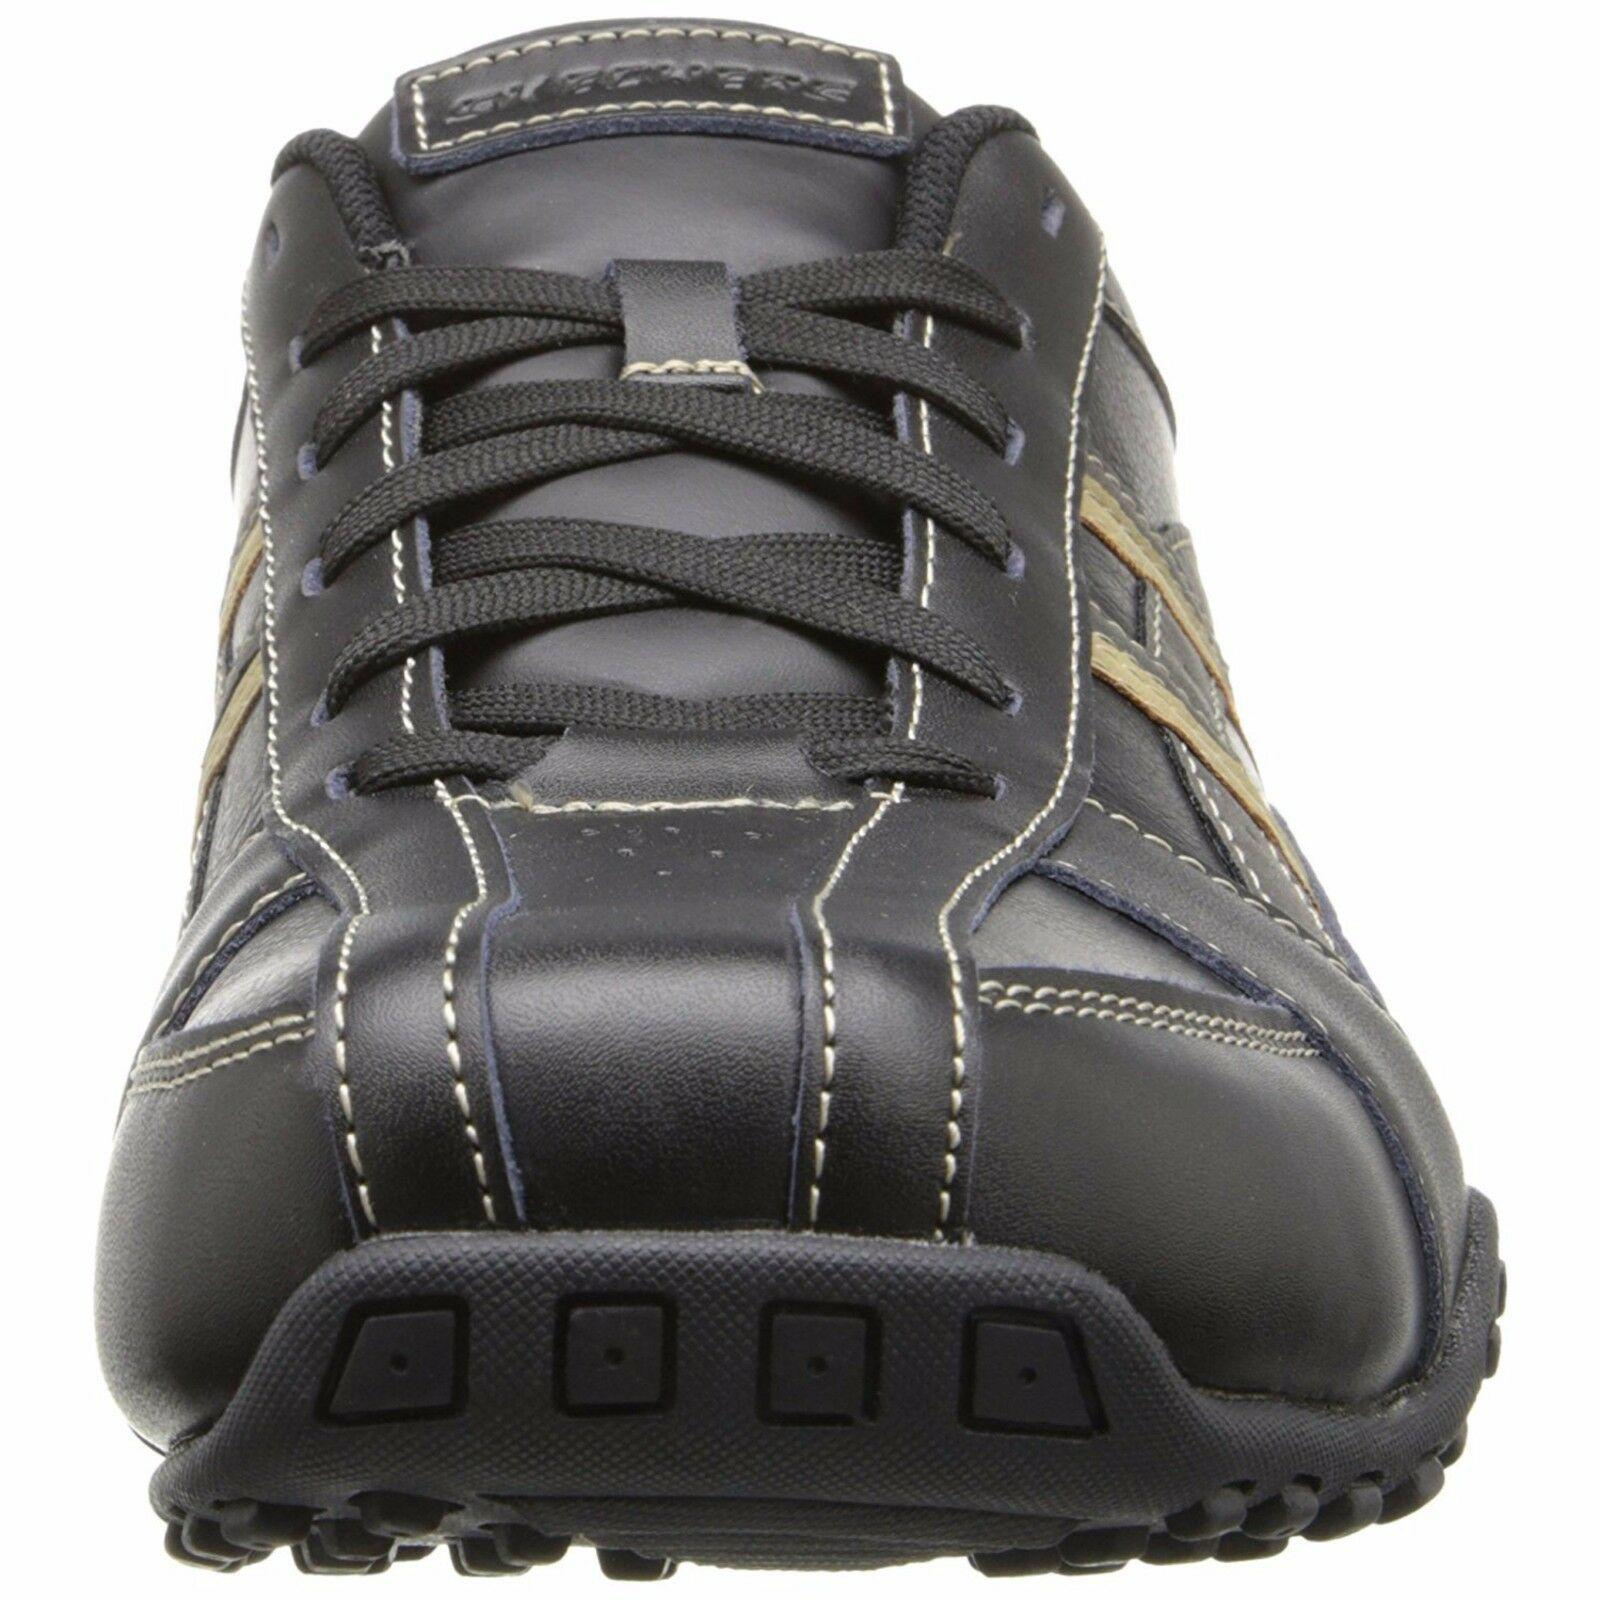 Skechers 64455/BLK Black, USA Men's Citywalk Malton Oxford Sneaker